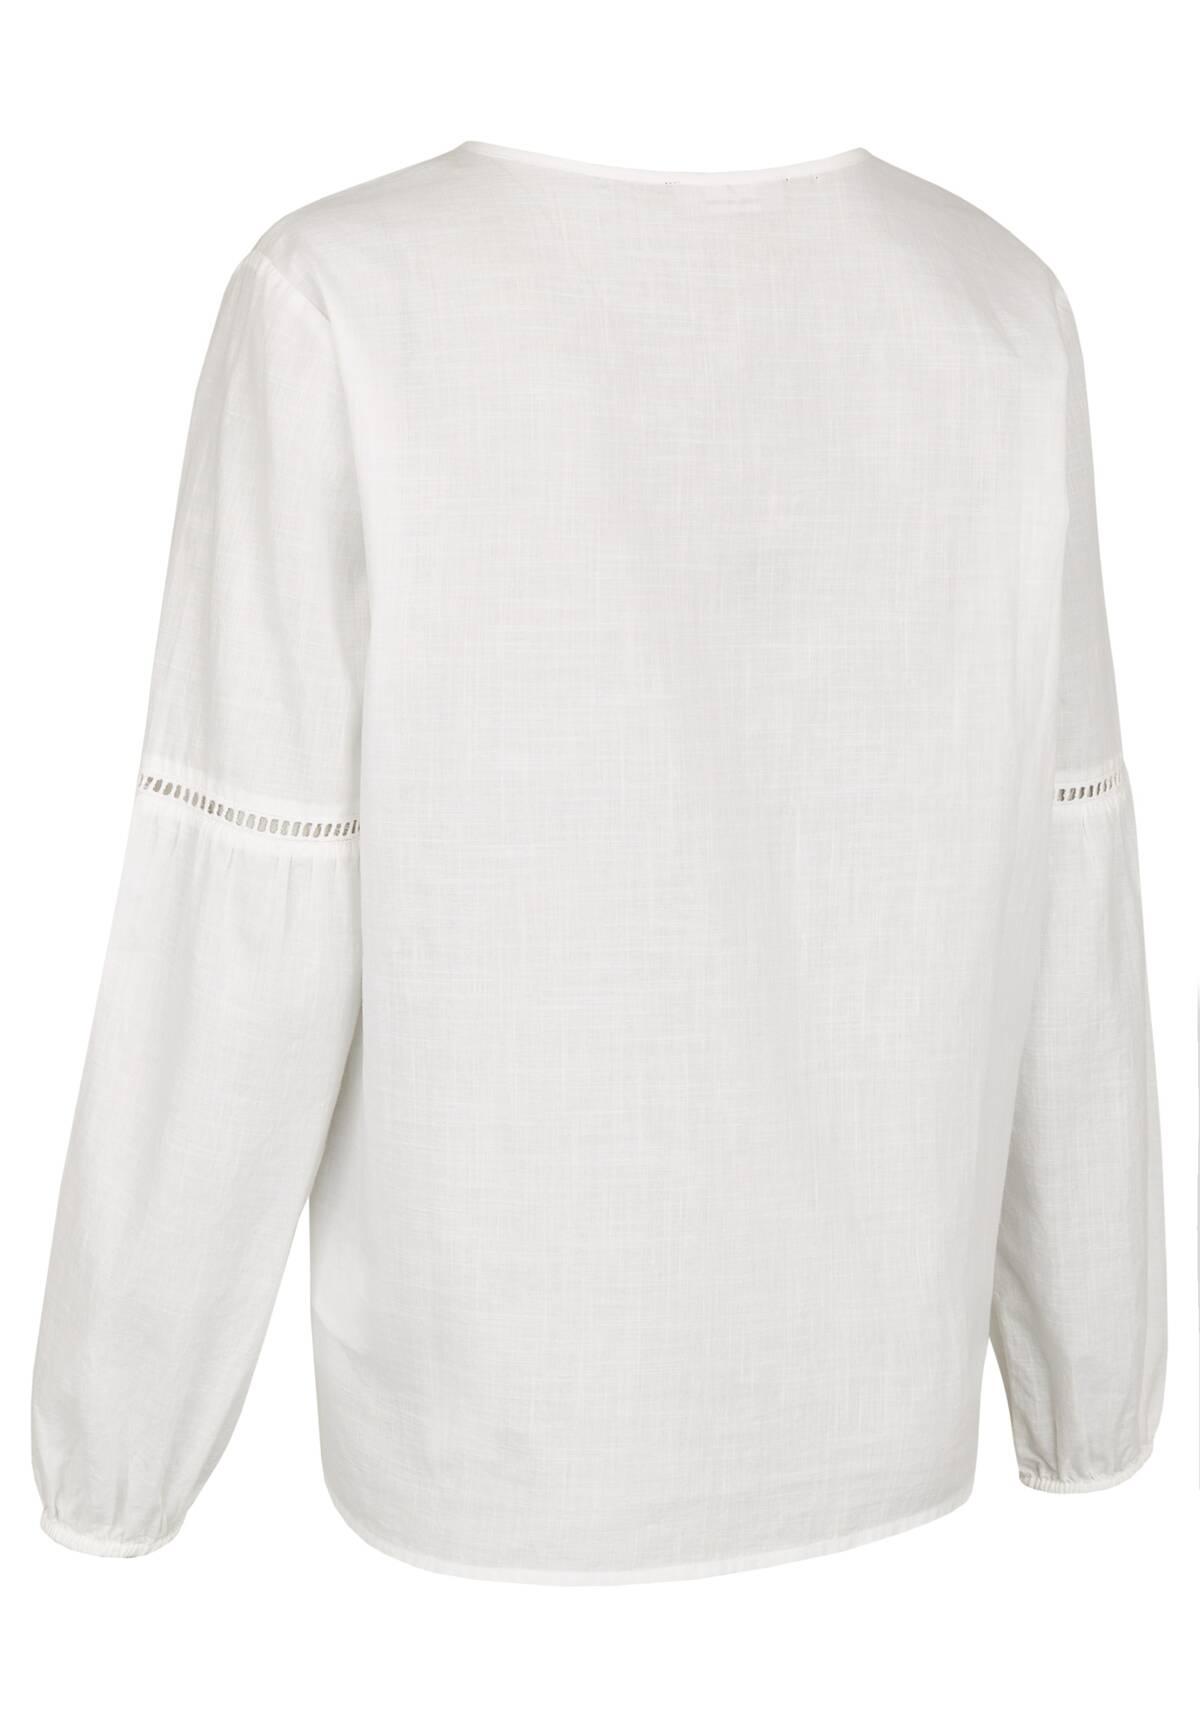 Sommerliche Tunika-Bluse / Tunika Blouse